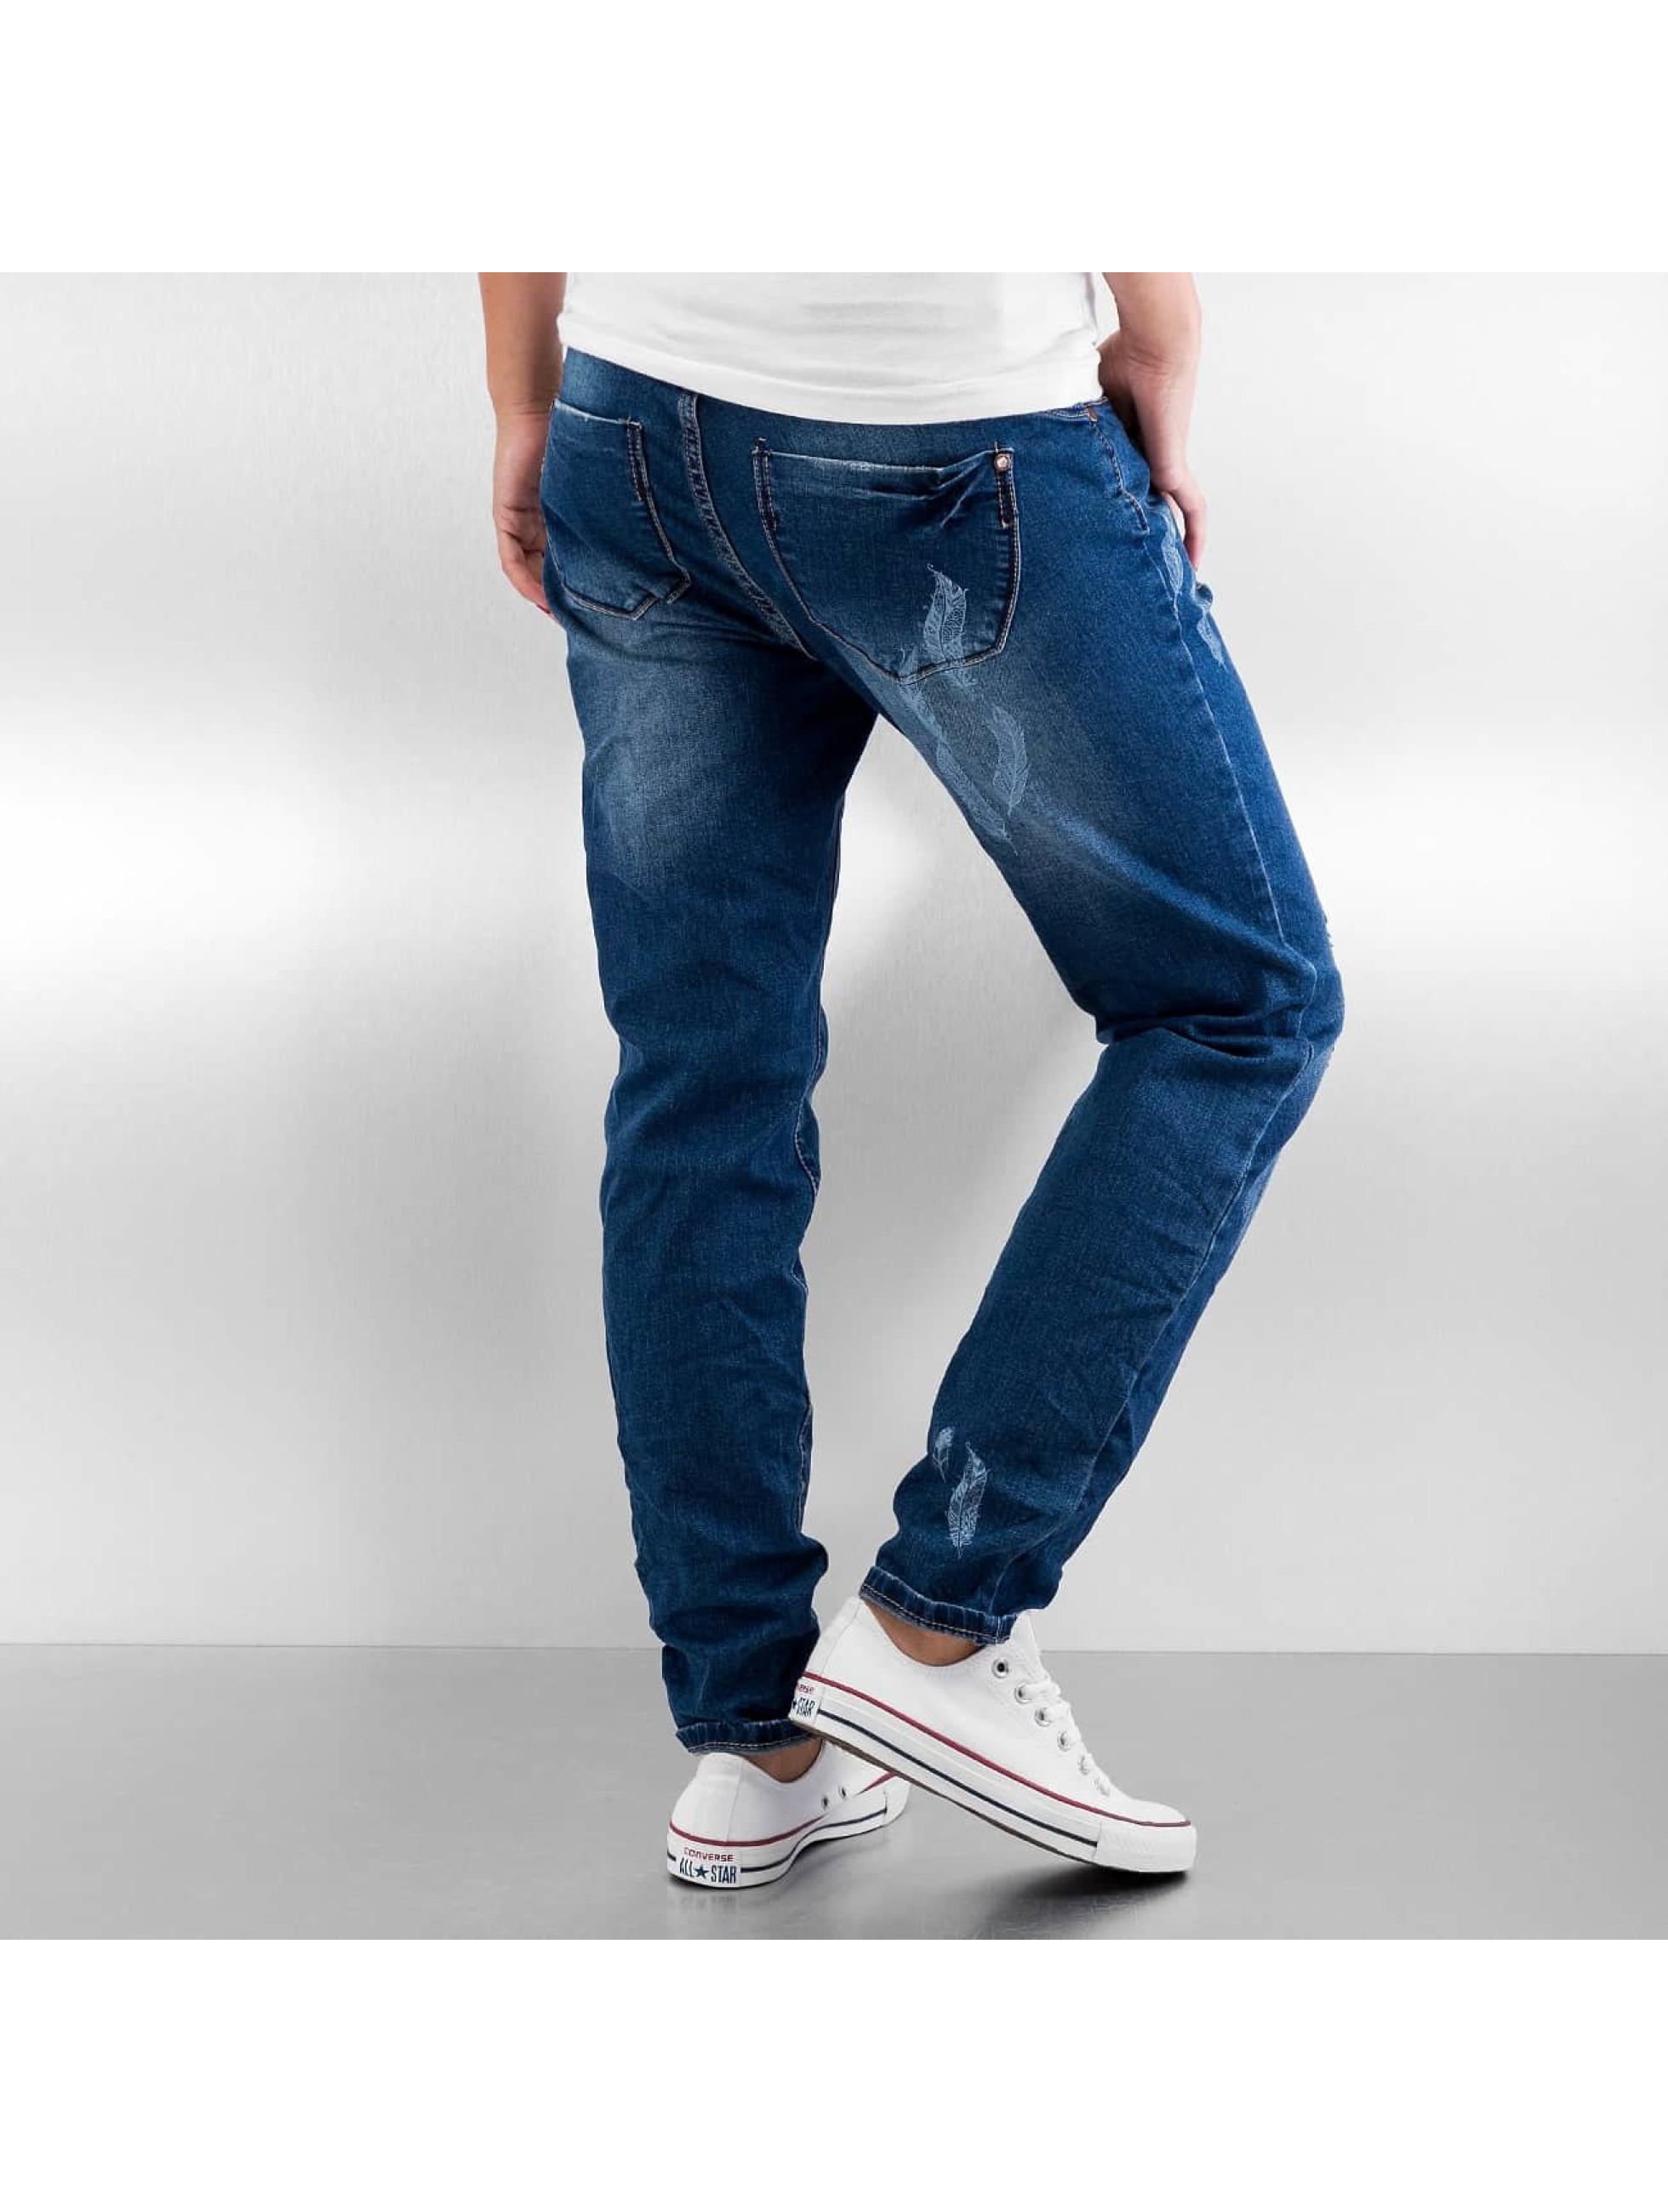 Authentic Style Облегающие джинсы Feather синий